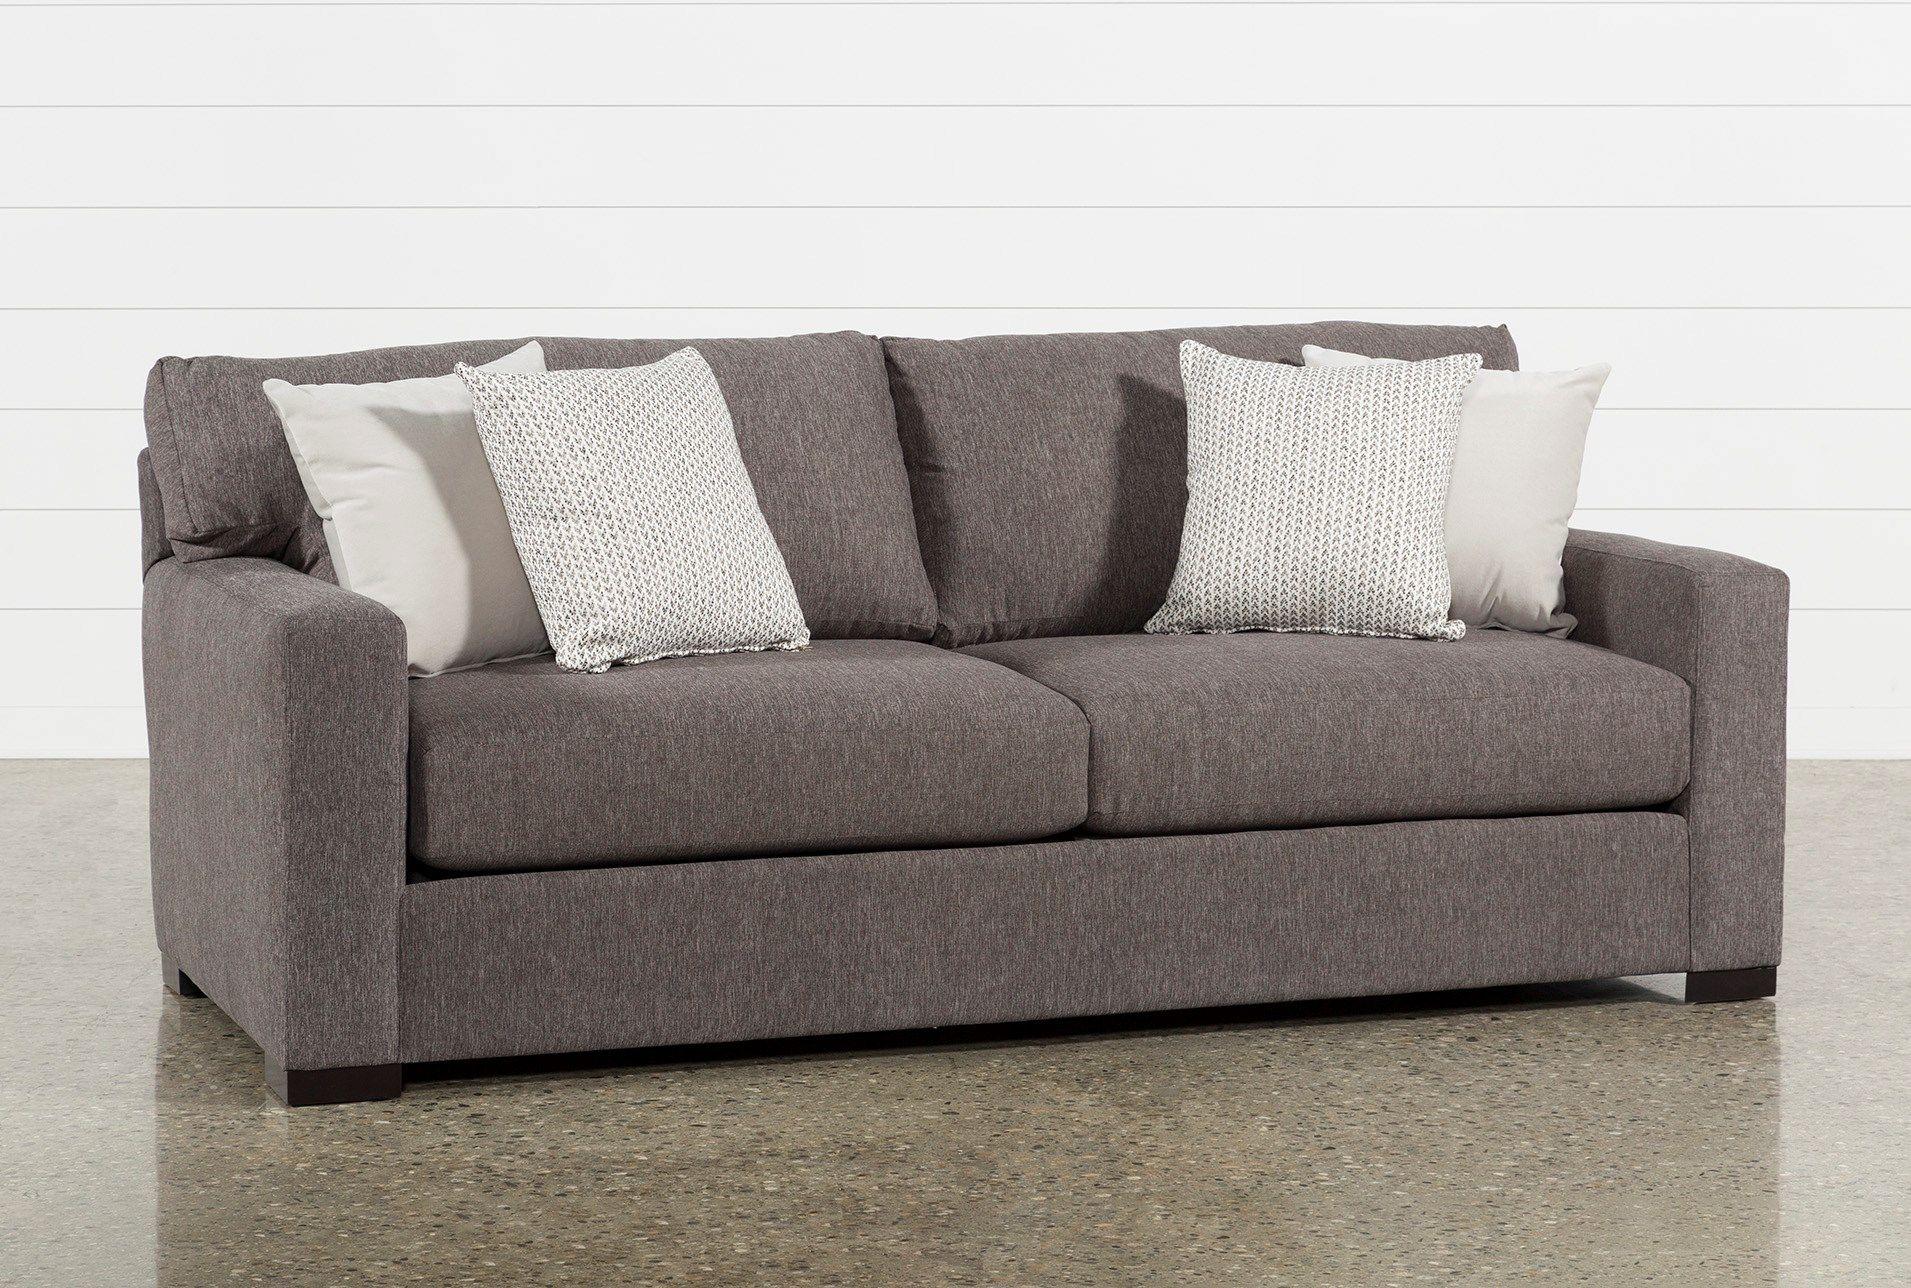 Mercer Foam Condo Sofa Living Spaces Condo Sofa Sofa Trundle